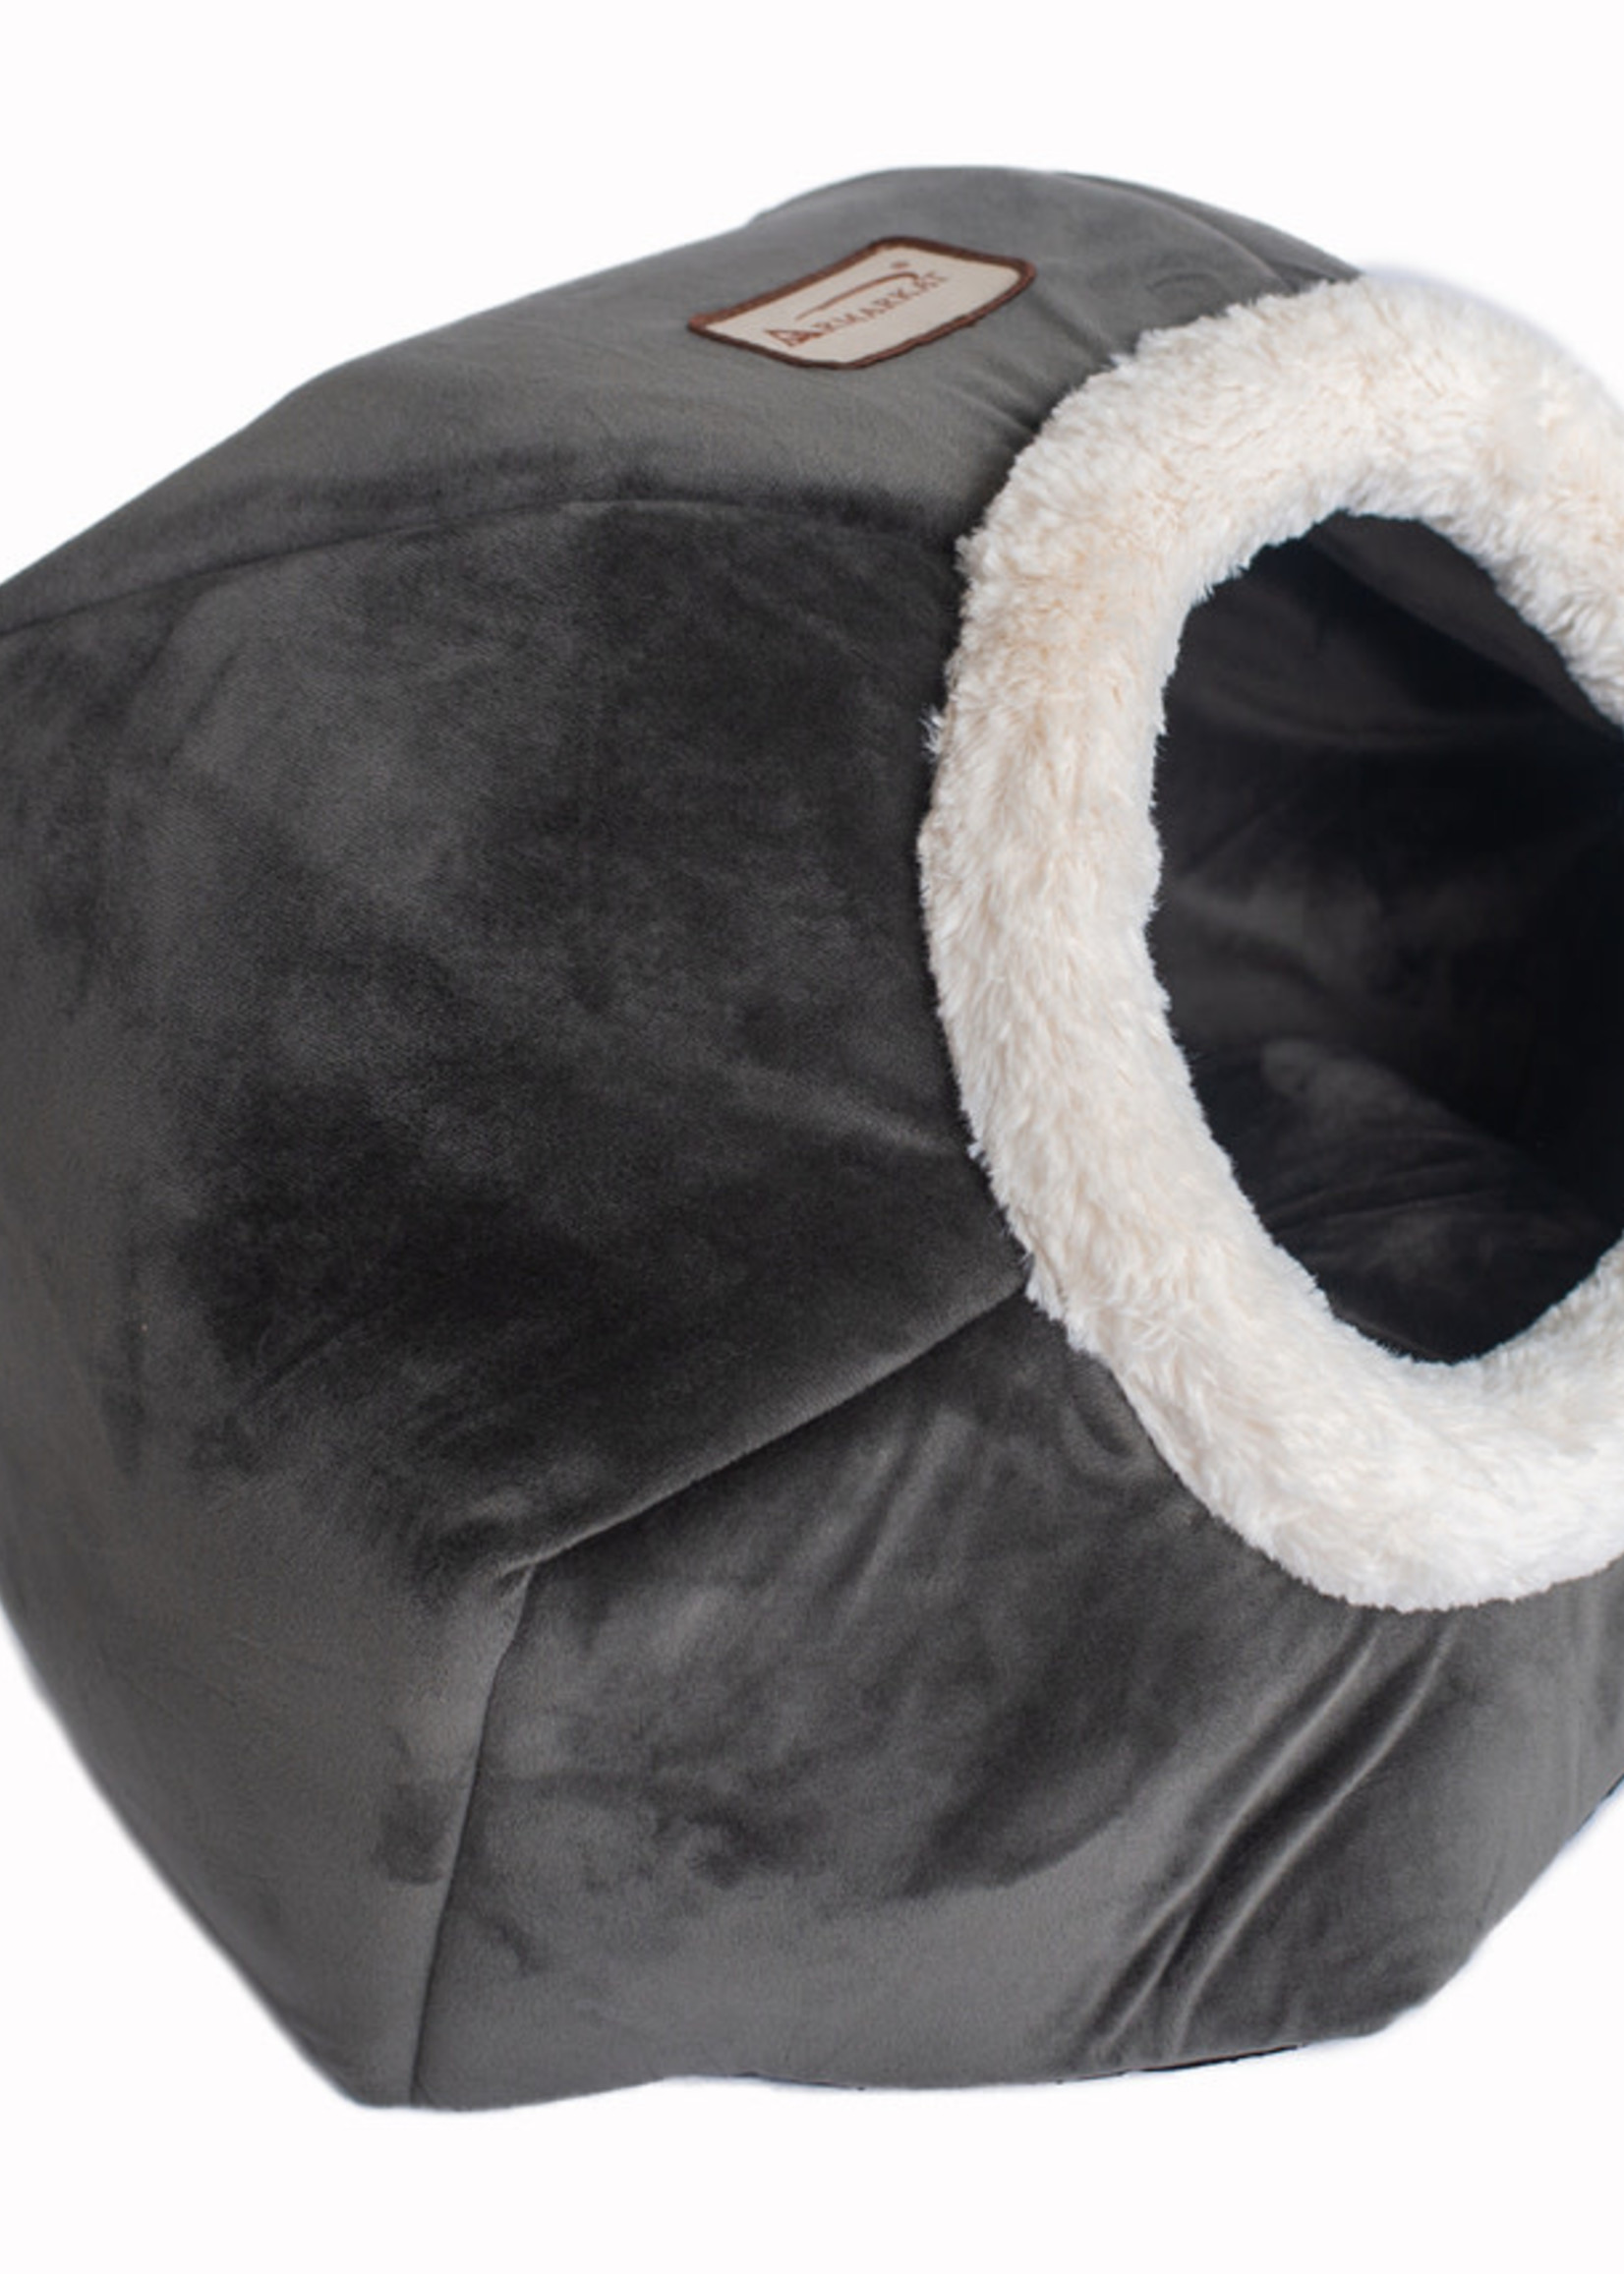 Armarkat Armarkat Cat Bed Gray Velvet